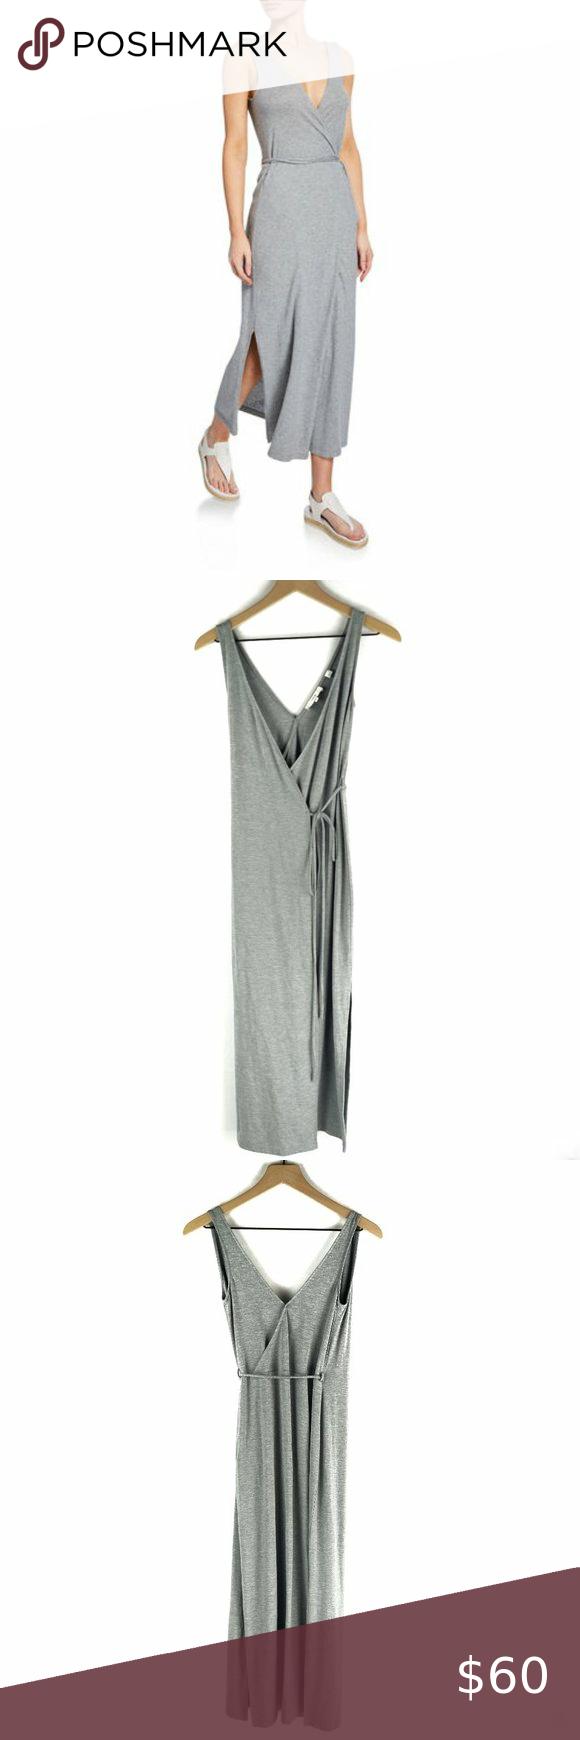 Vince Grey Sleeveless Midi Wrap Dress Size Xxs Midi Wrap Dress Wrap Dress Sleeveless [ 1740 x 580 Pixel ]